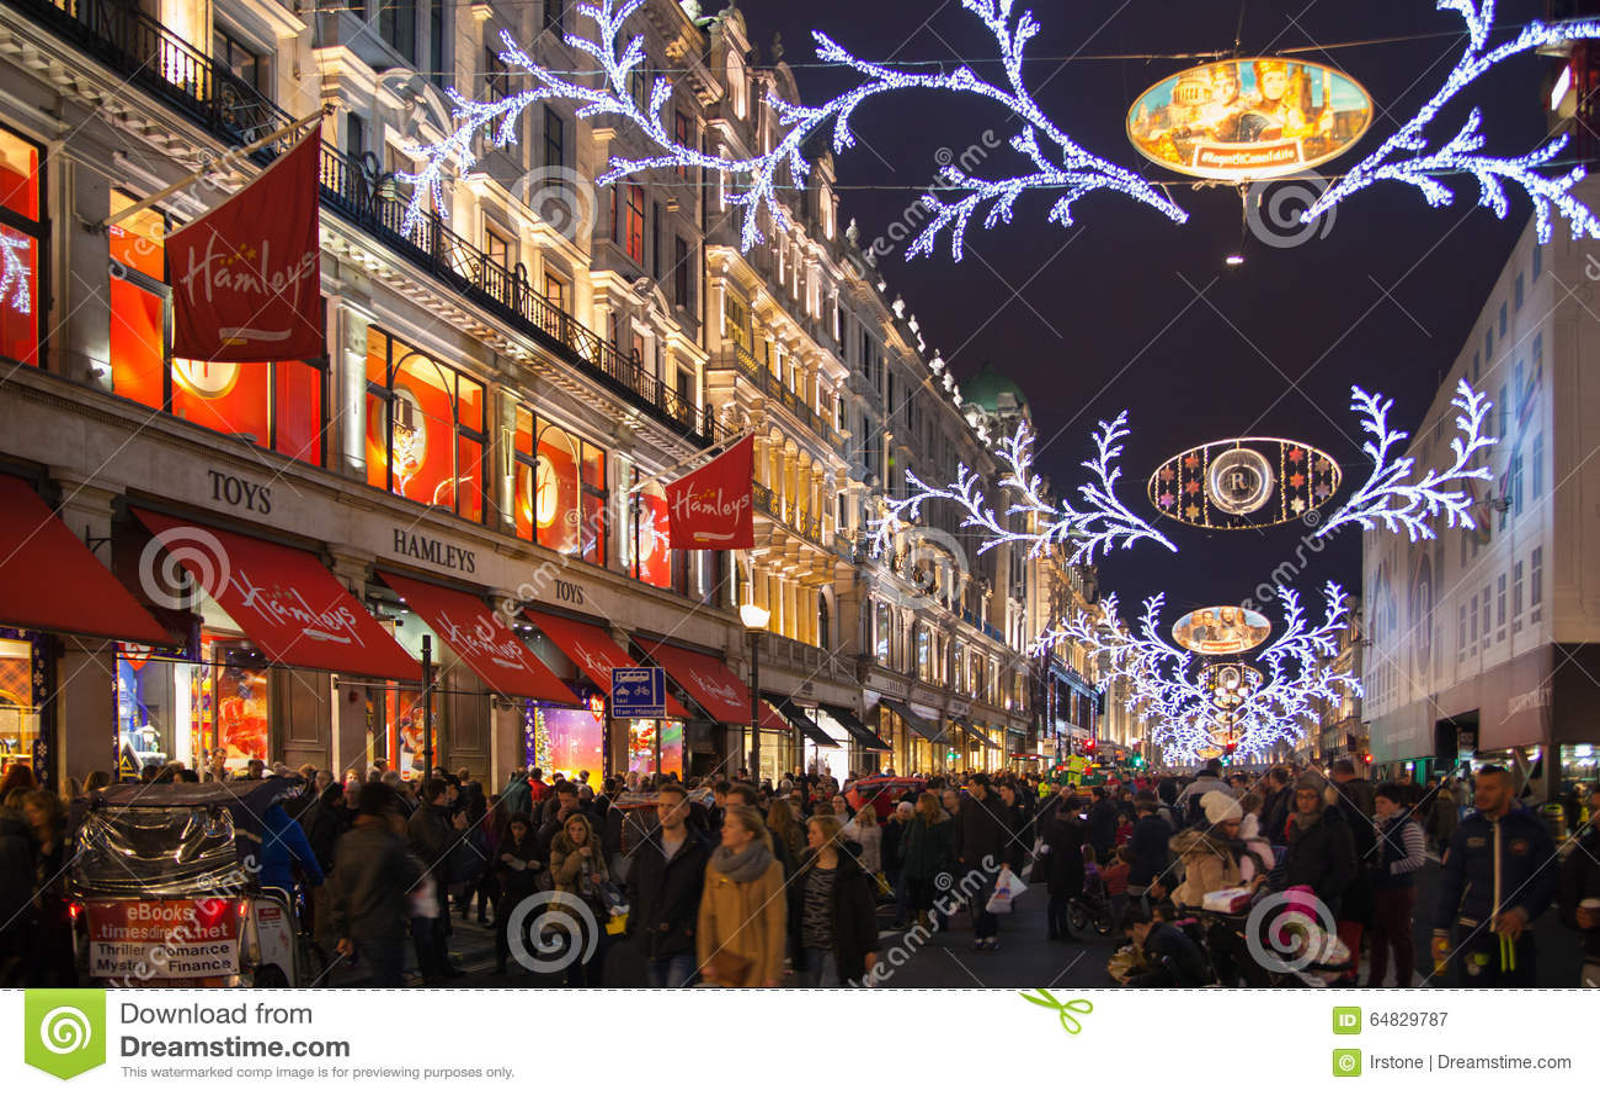 #BE300D Regent Street Londres Obtient La Décoration De Noël Les  5317 decorations de noel a londres 1300x907 px @ aertt.com